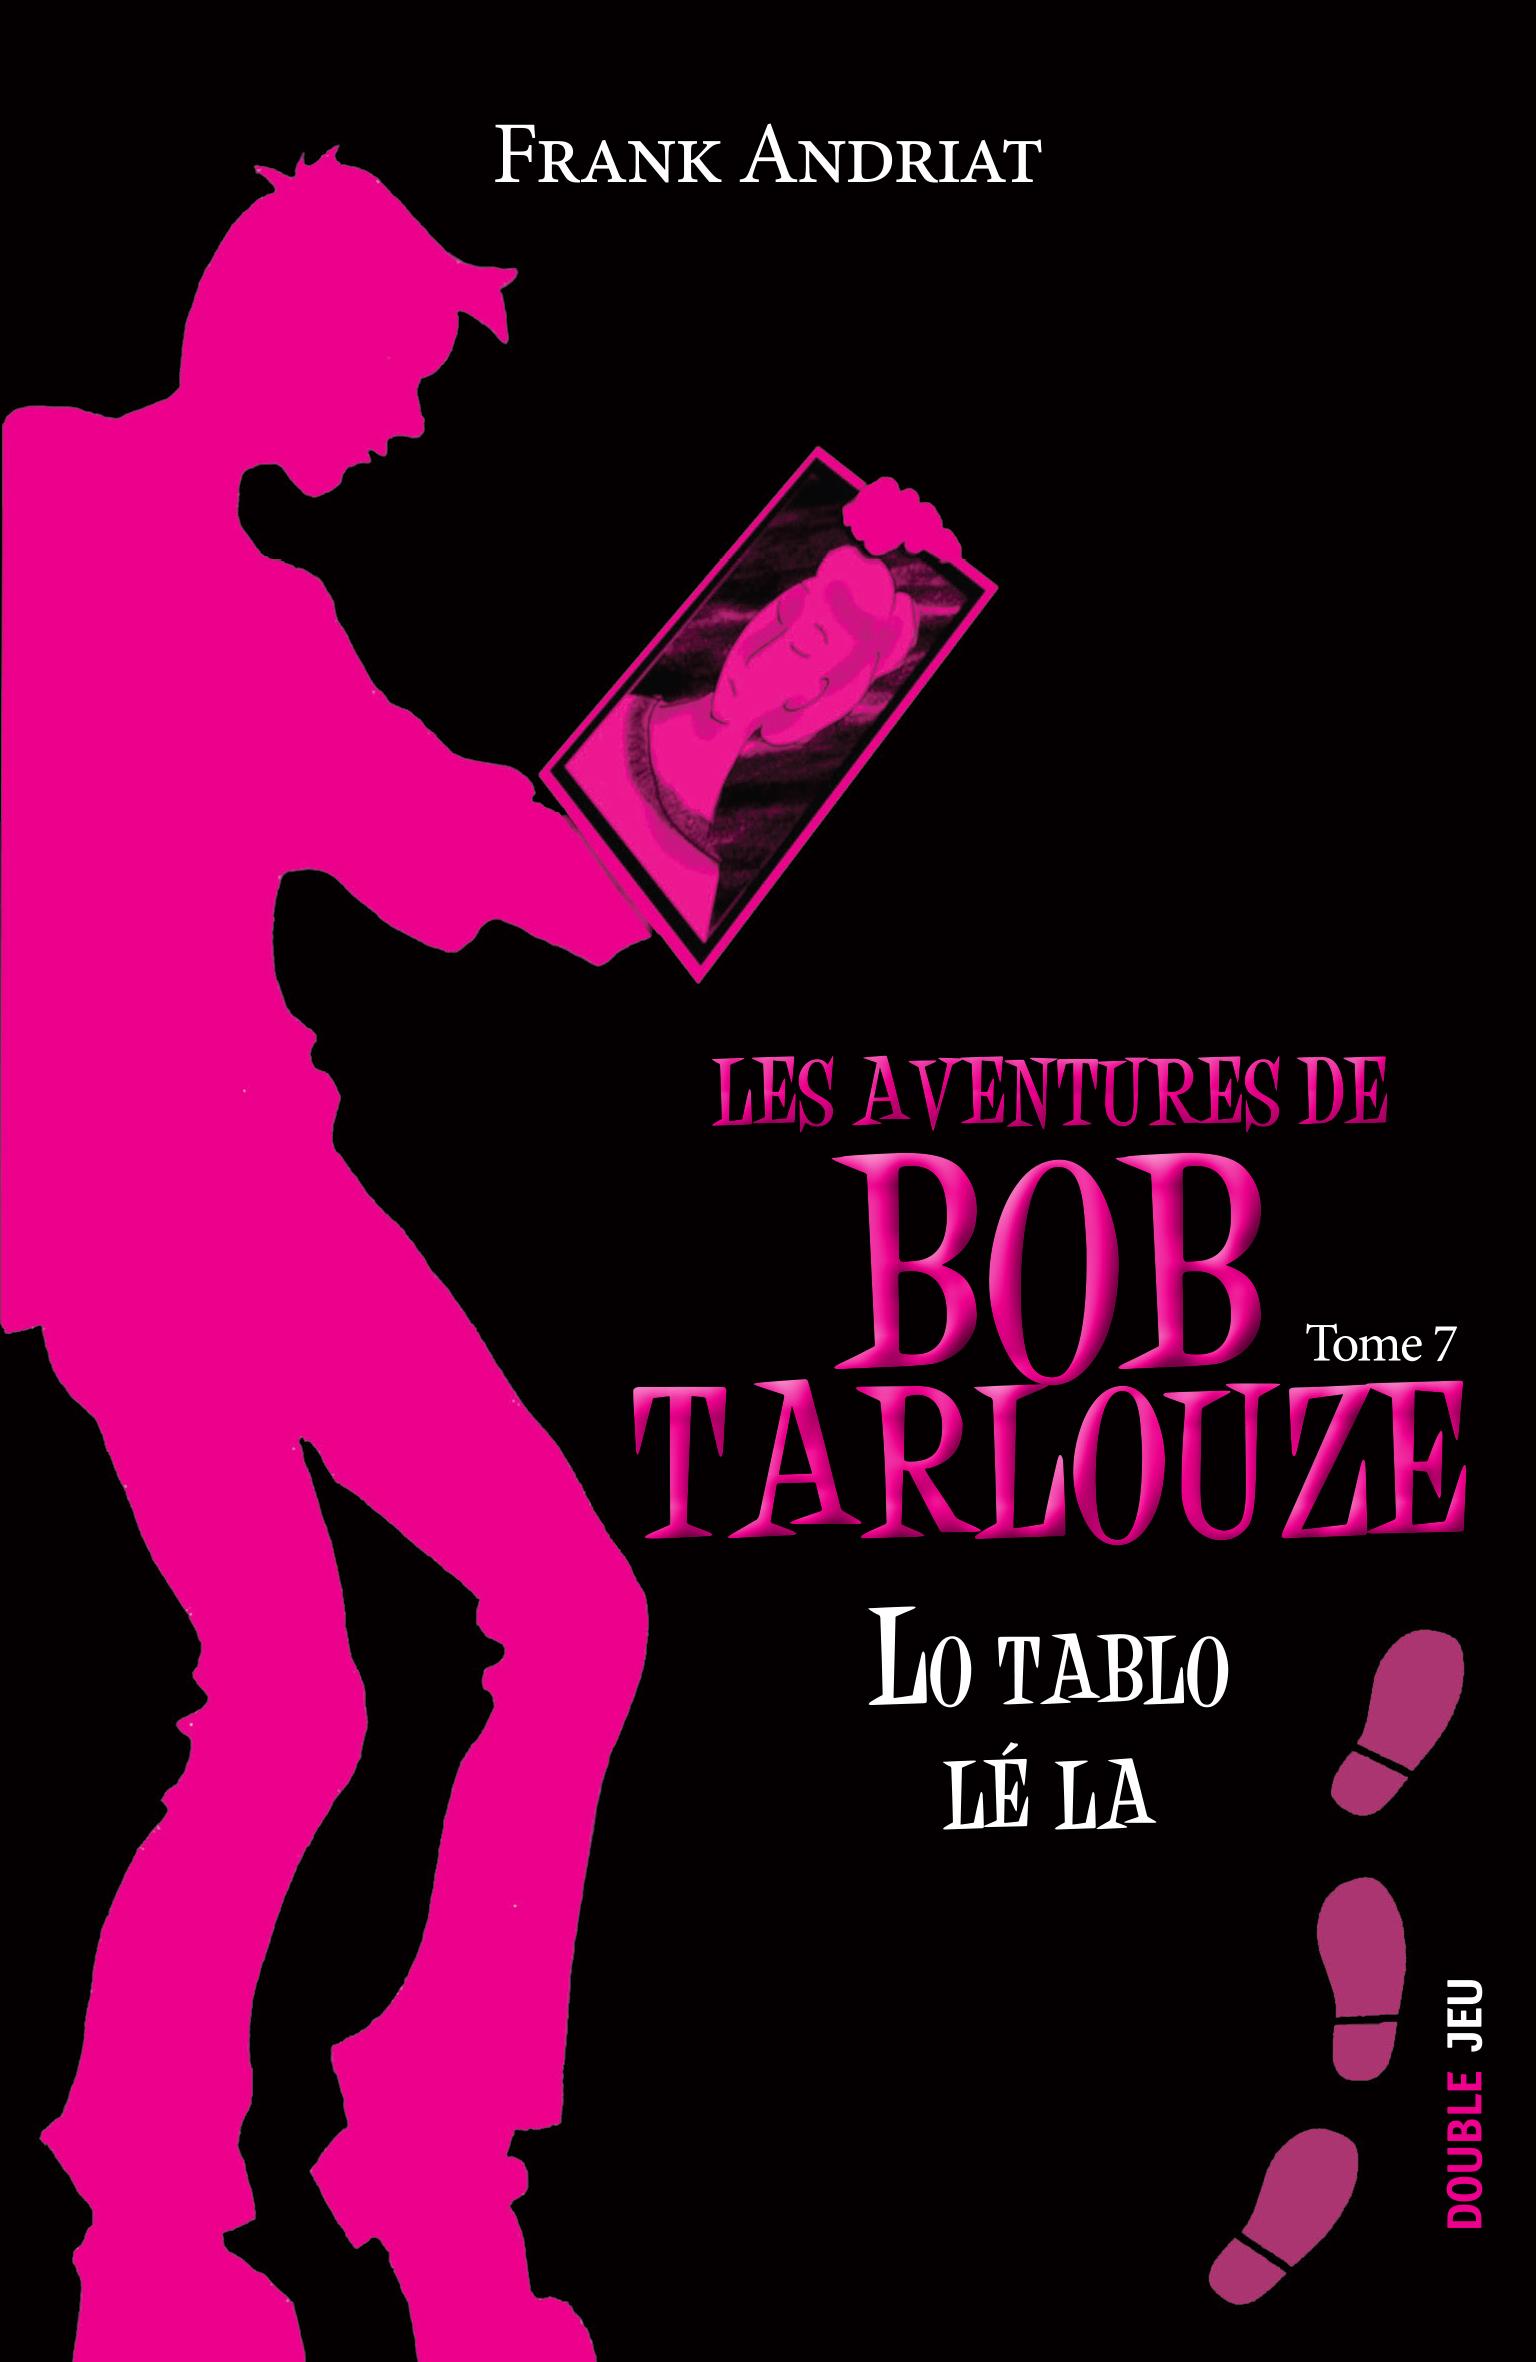 Les aventures de Bob Tarlouze (tome 7) : Lo tablo lé la